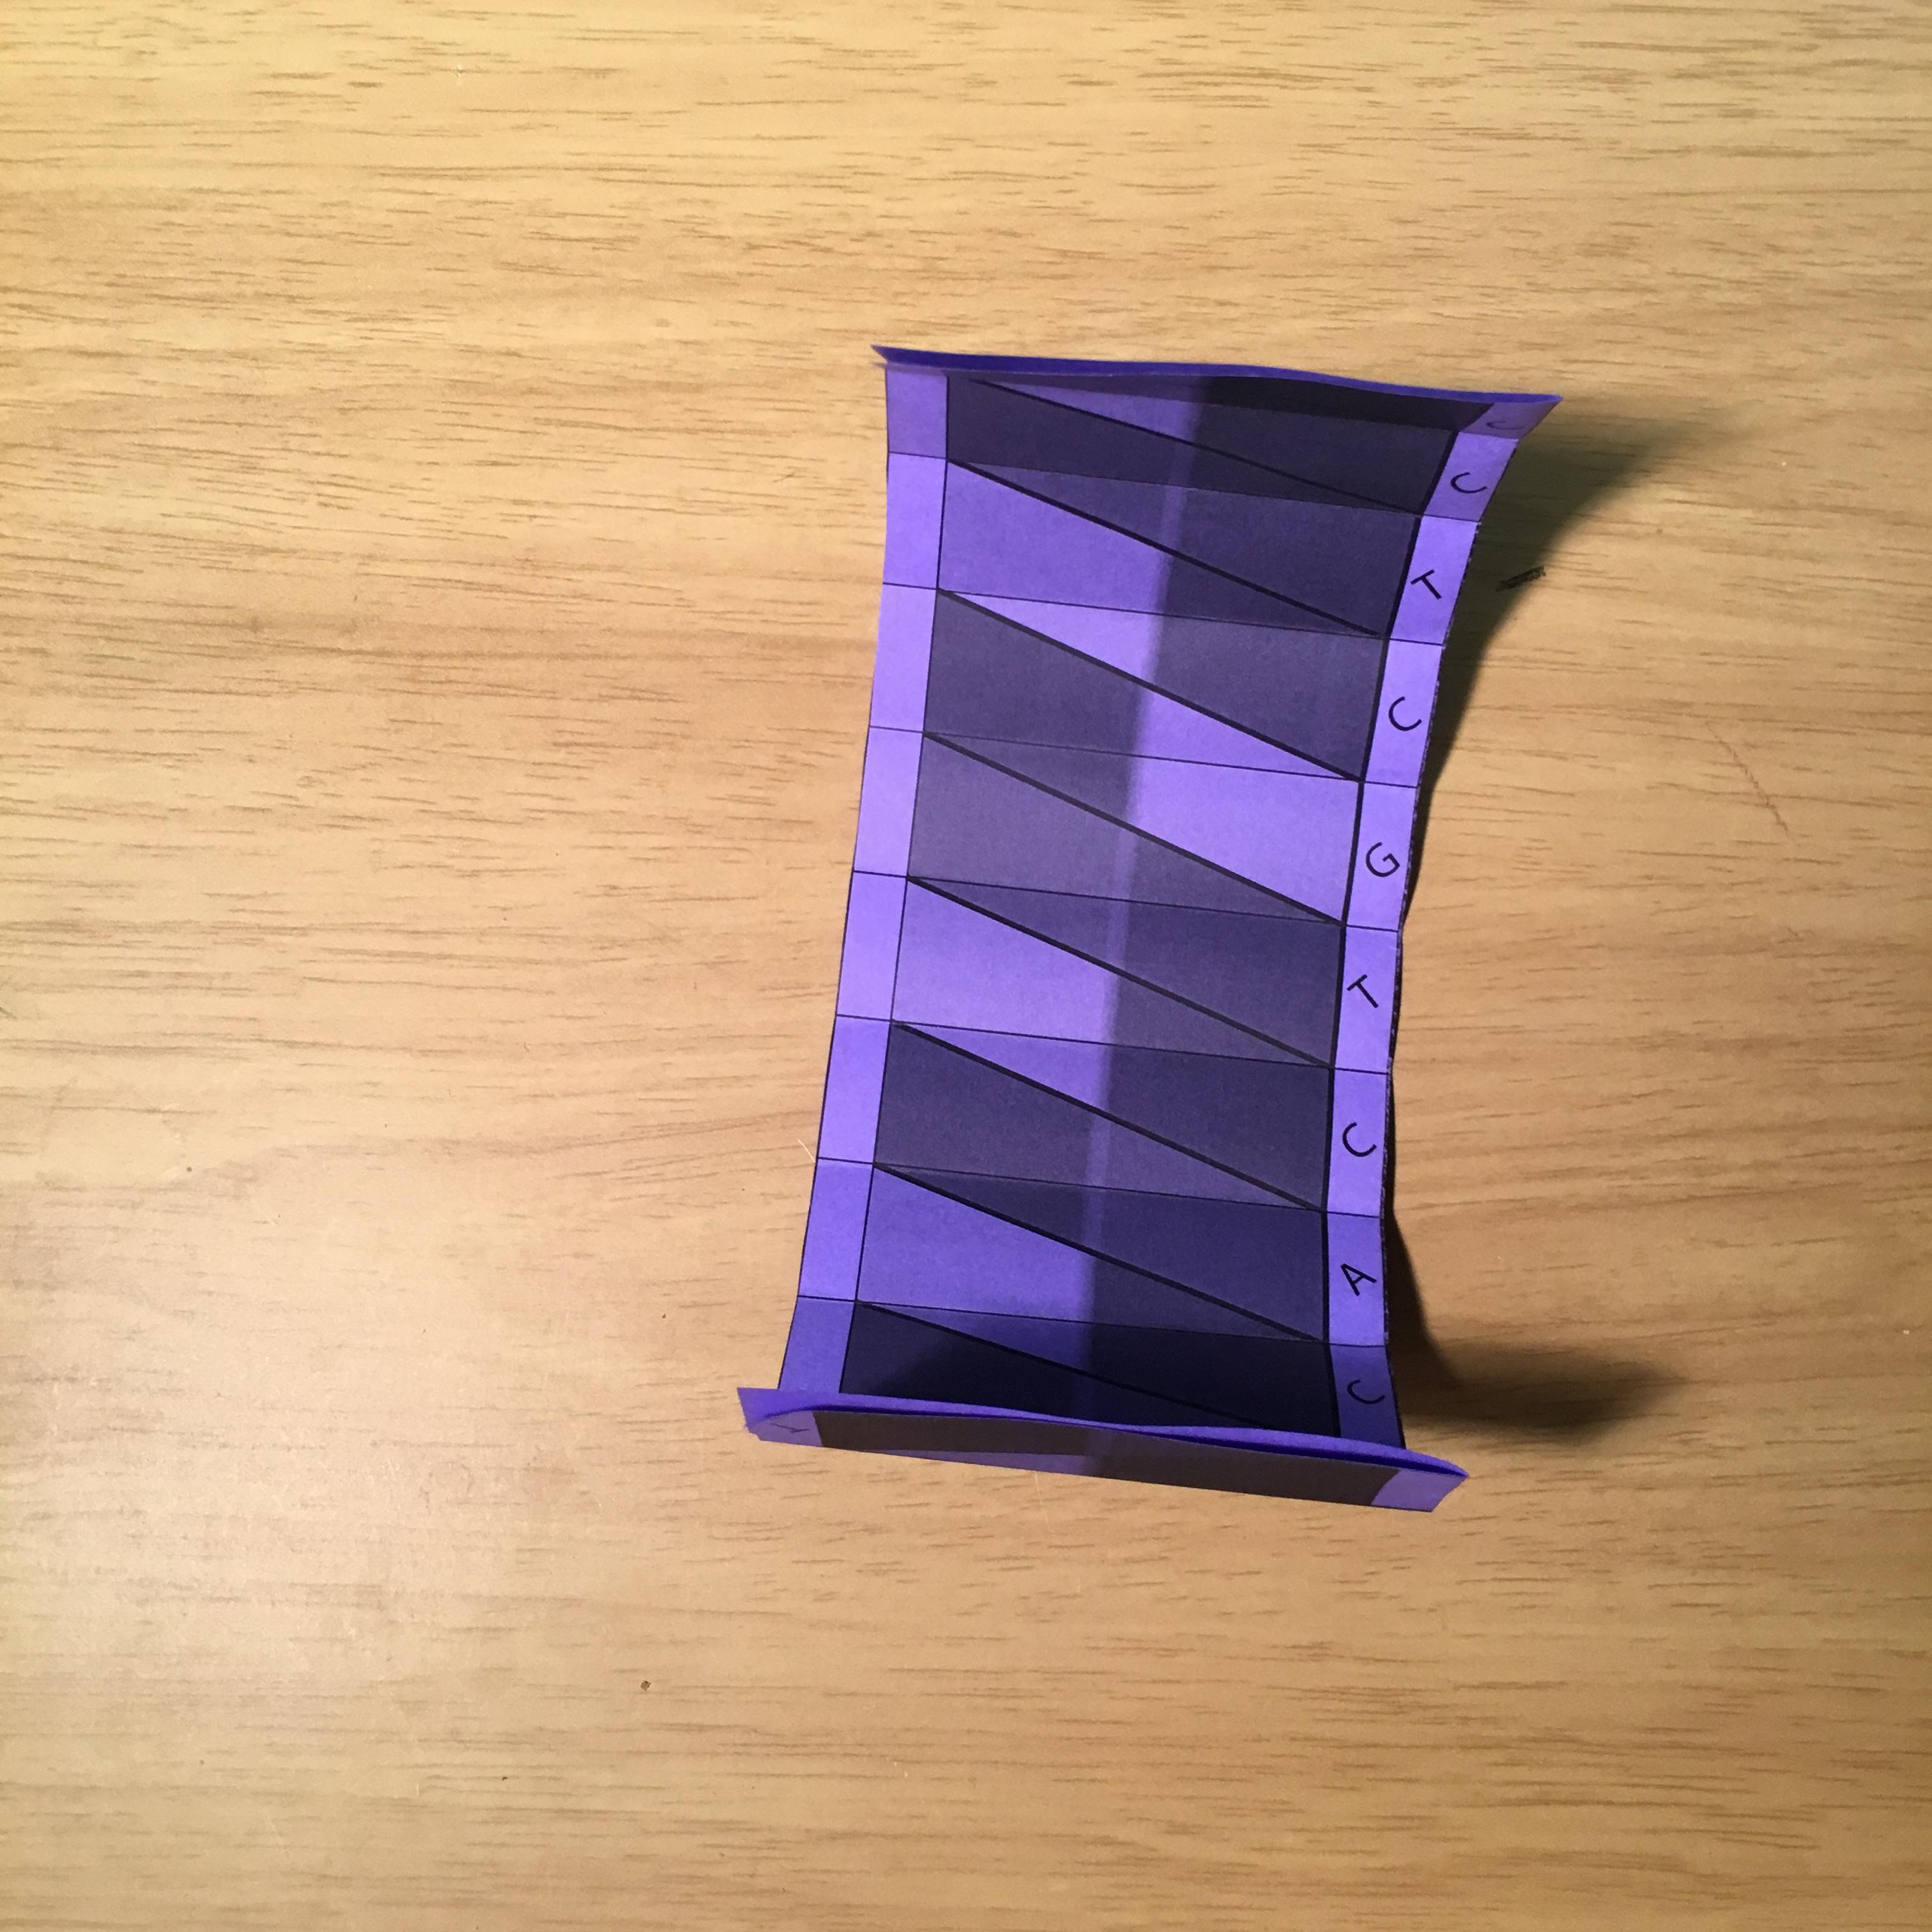 Dna Double Helix Model Origami